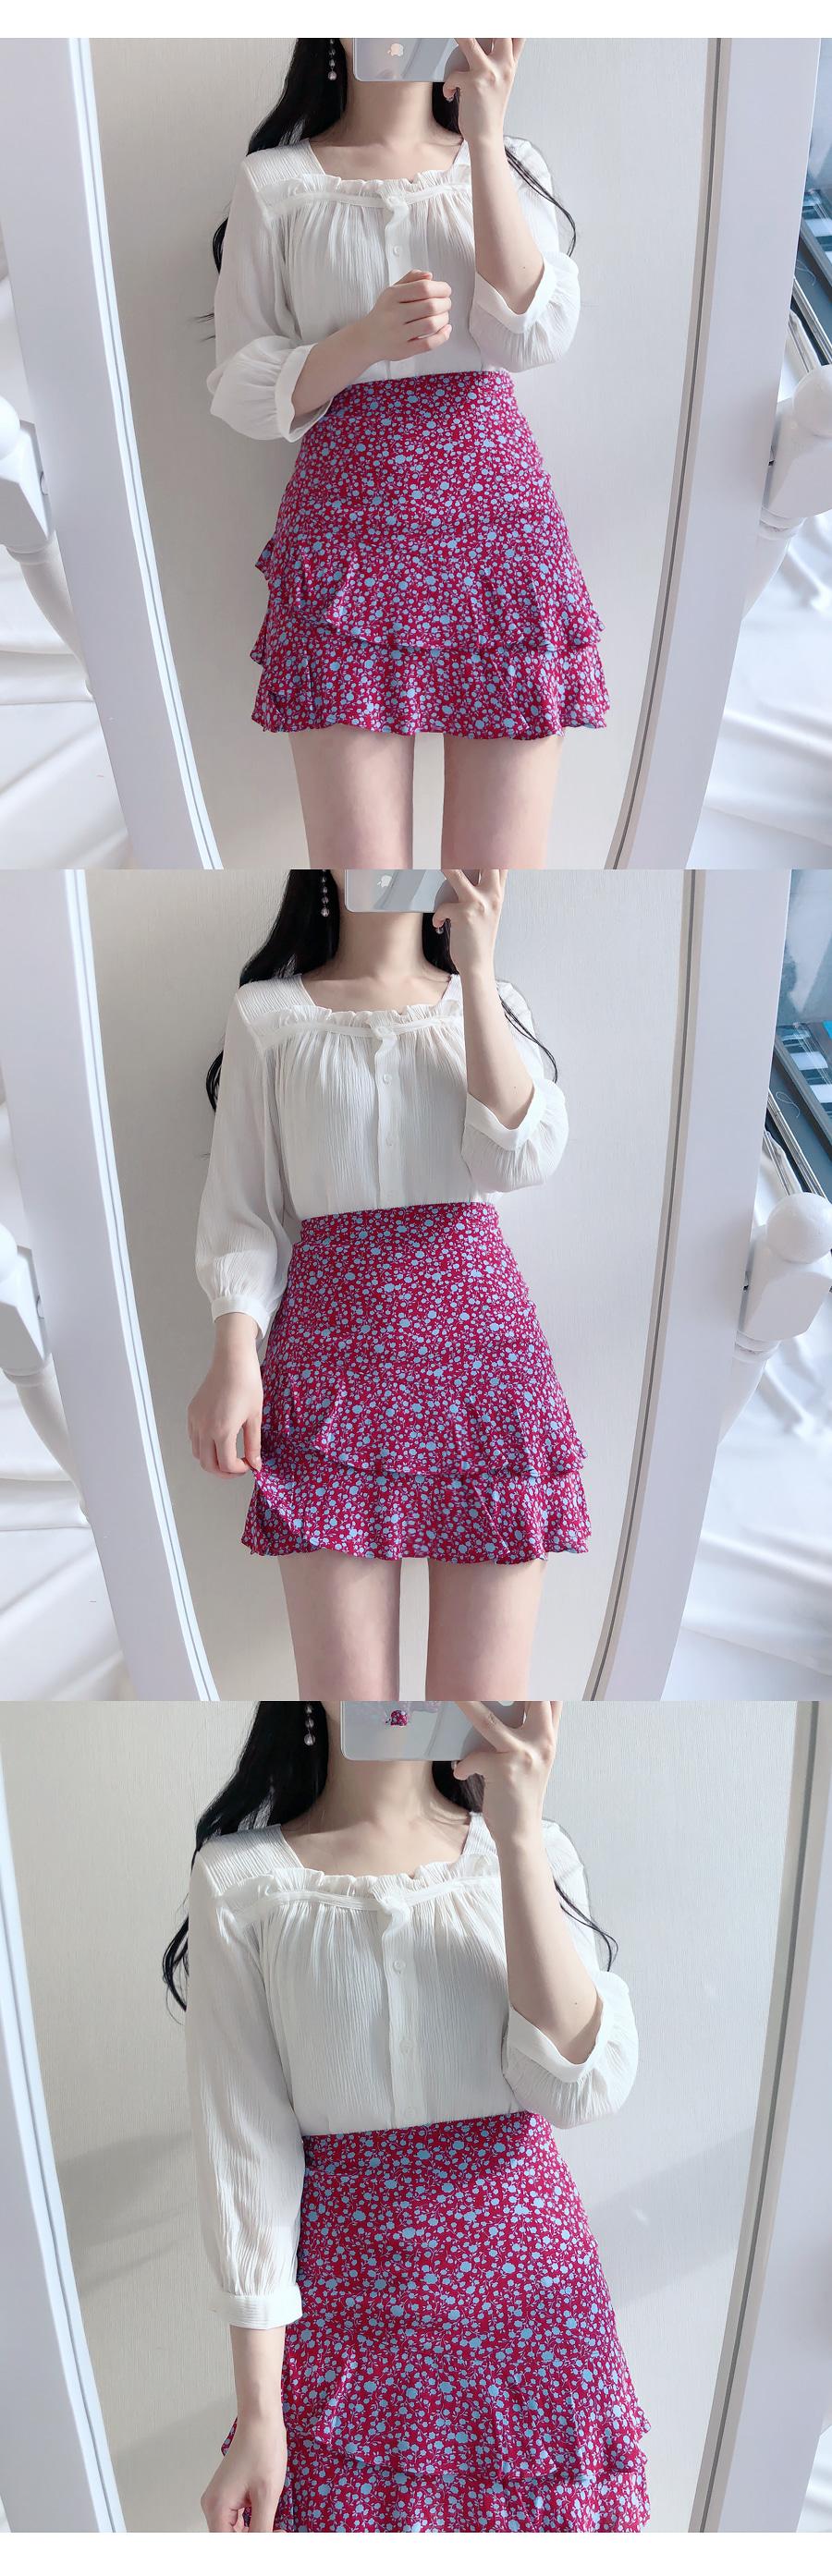 Square ruffle ♥ blouse